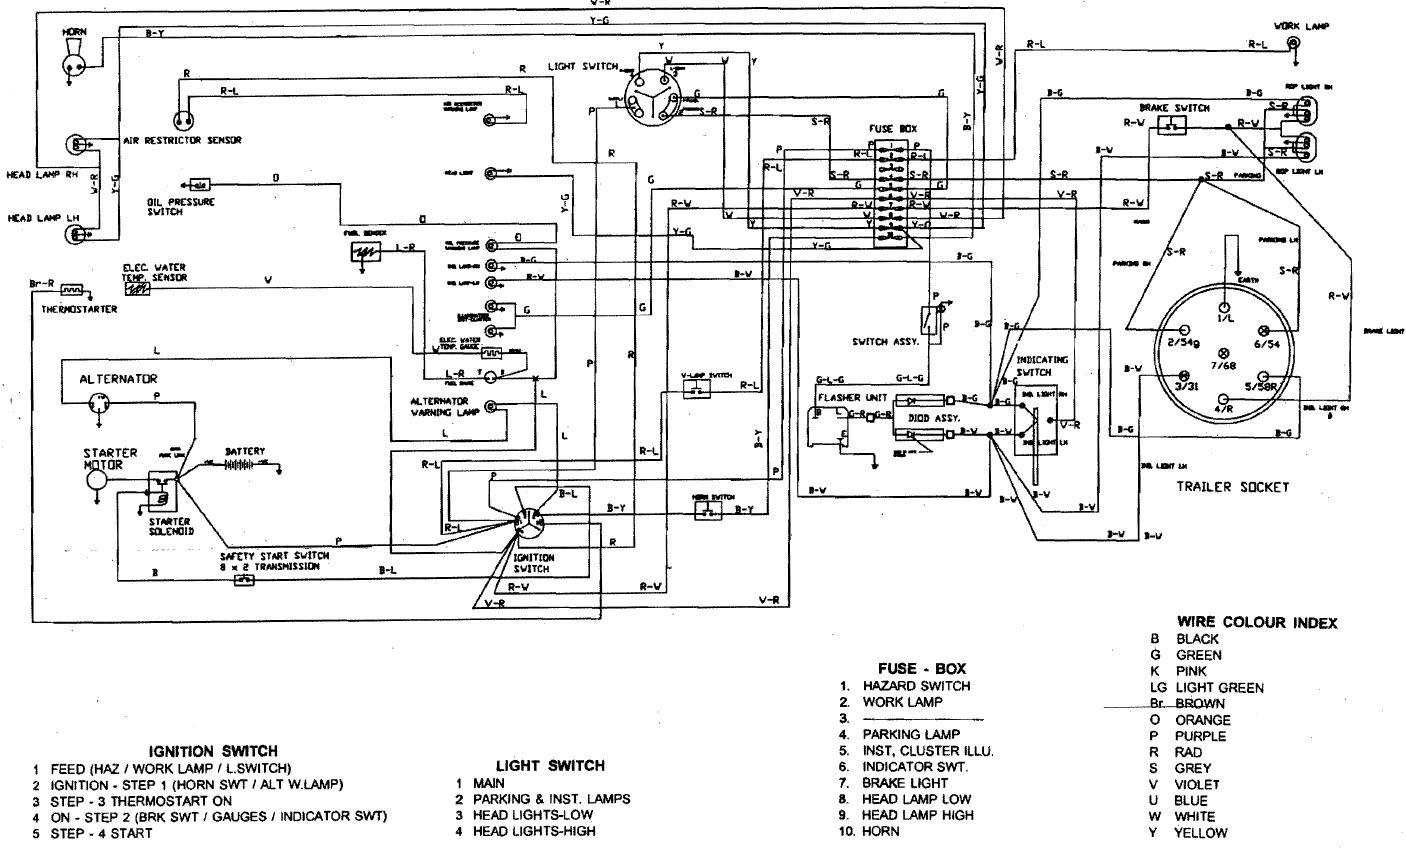 John Deere Wiring Diagram Download - Wiring Diagrams on